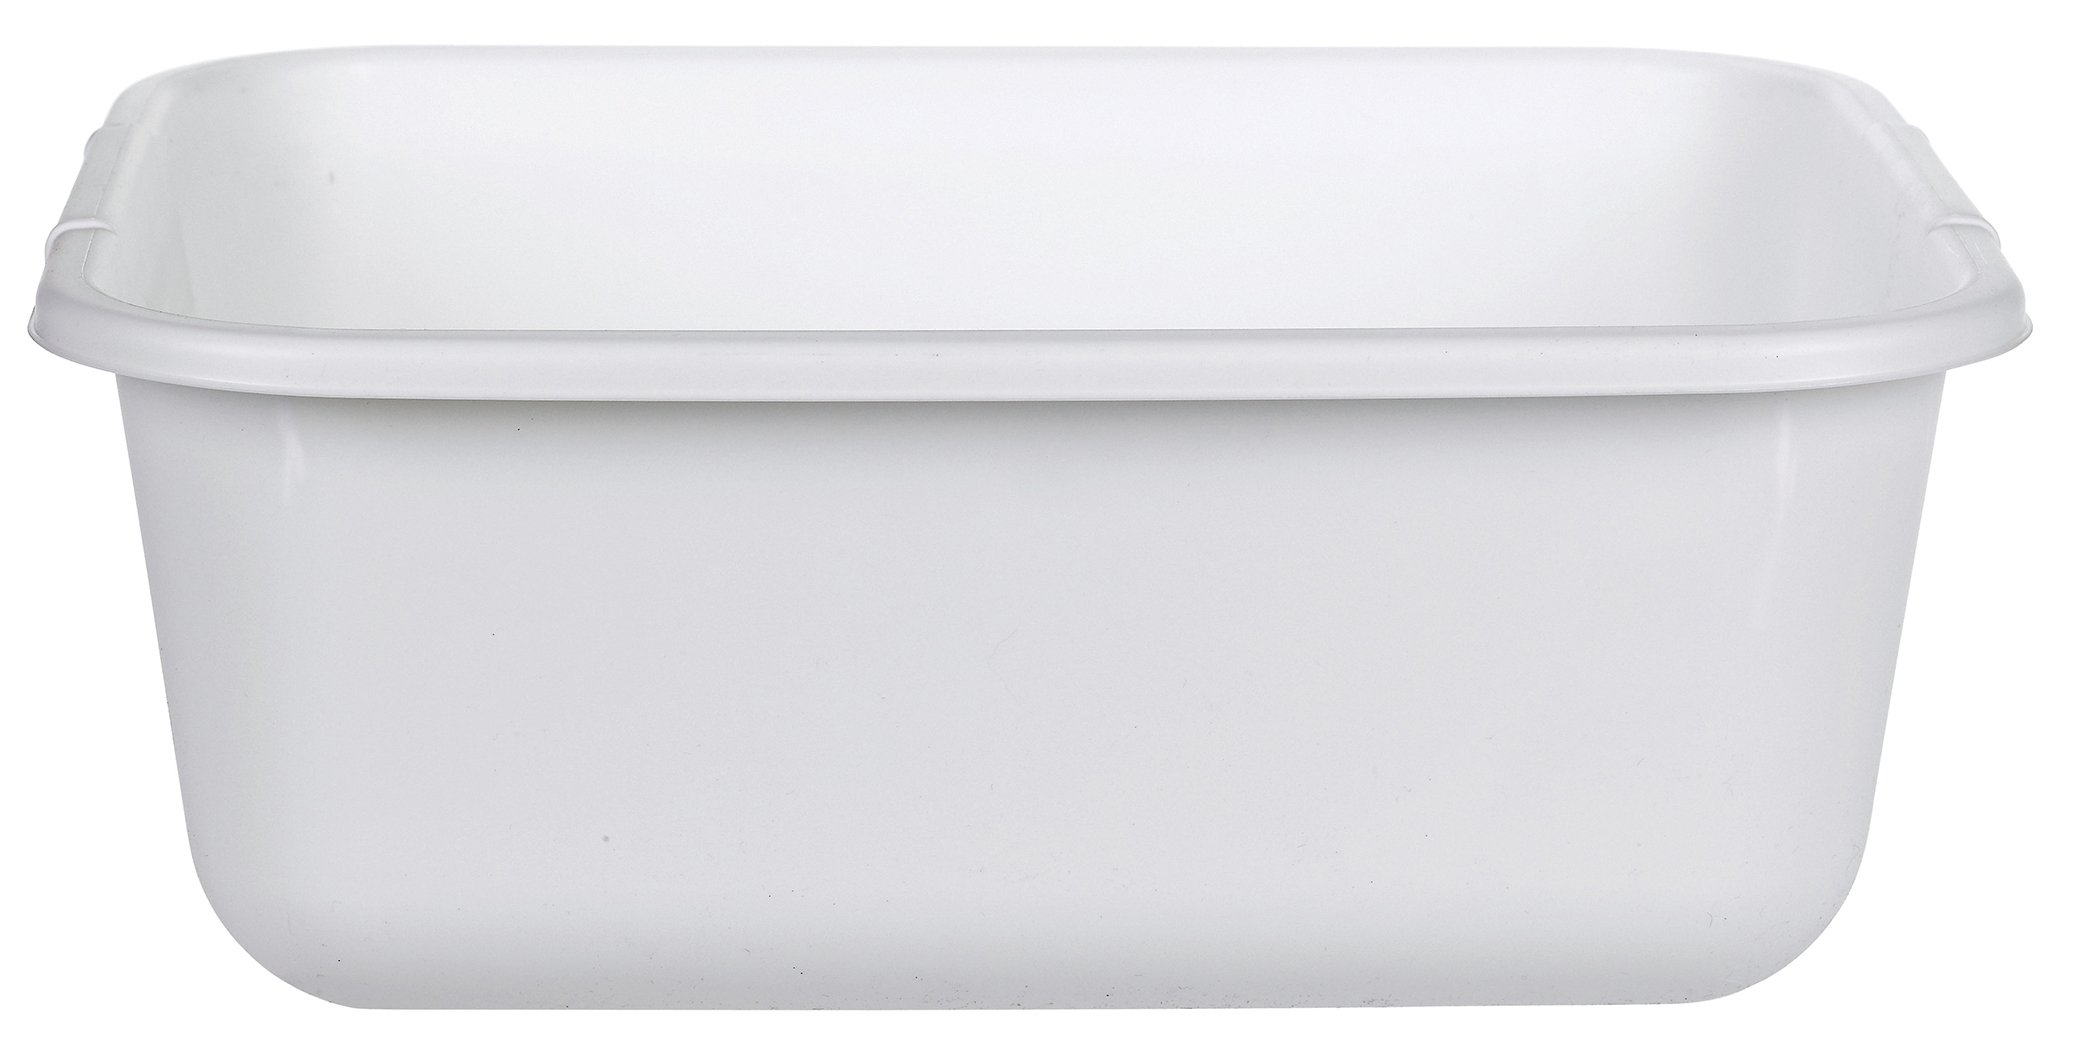 Rubbermaid Pan, 11.4-Quart, White FG295100WHT by Rubbermaid